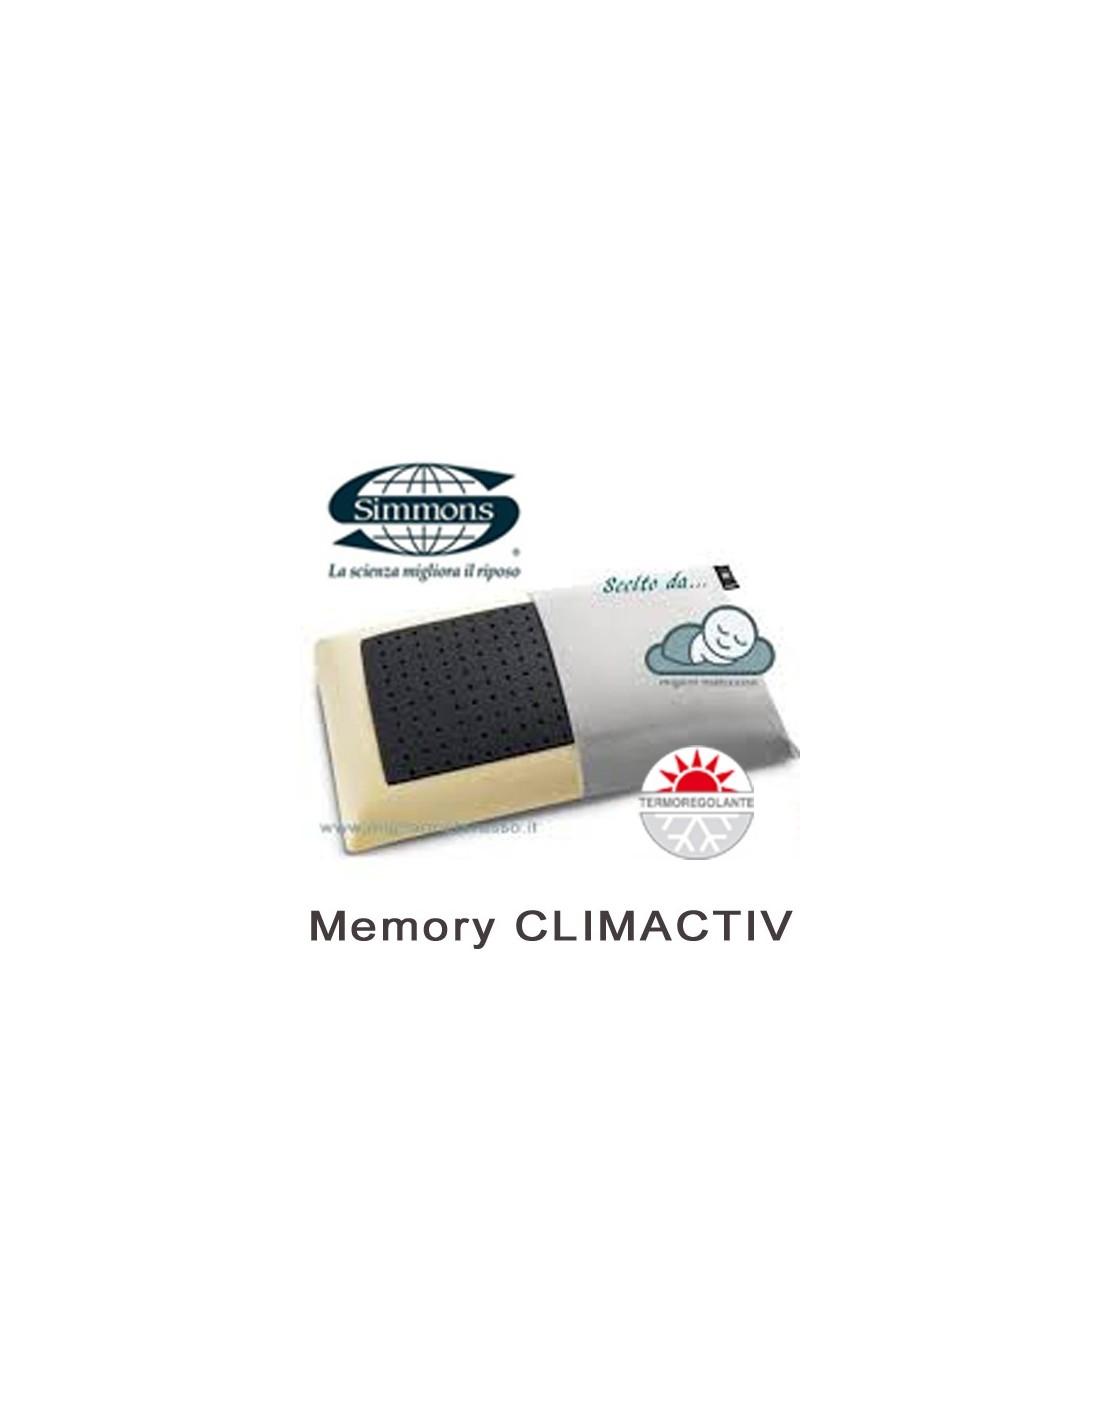 Cuscino Memory Simmons Climactiv fresco traspirante in